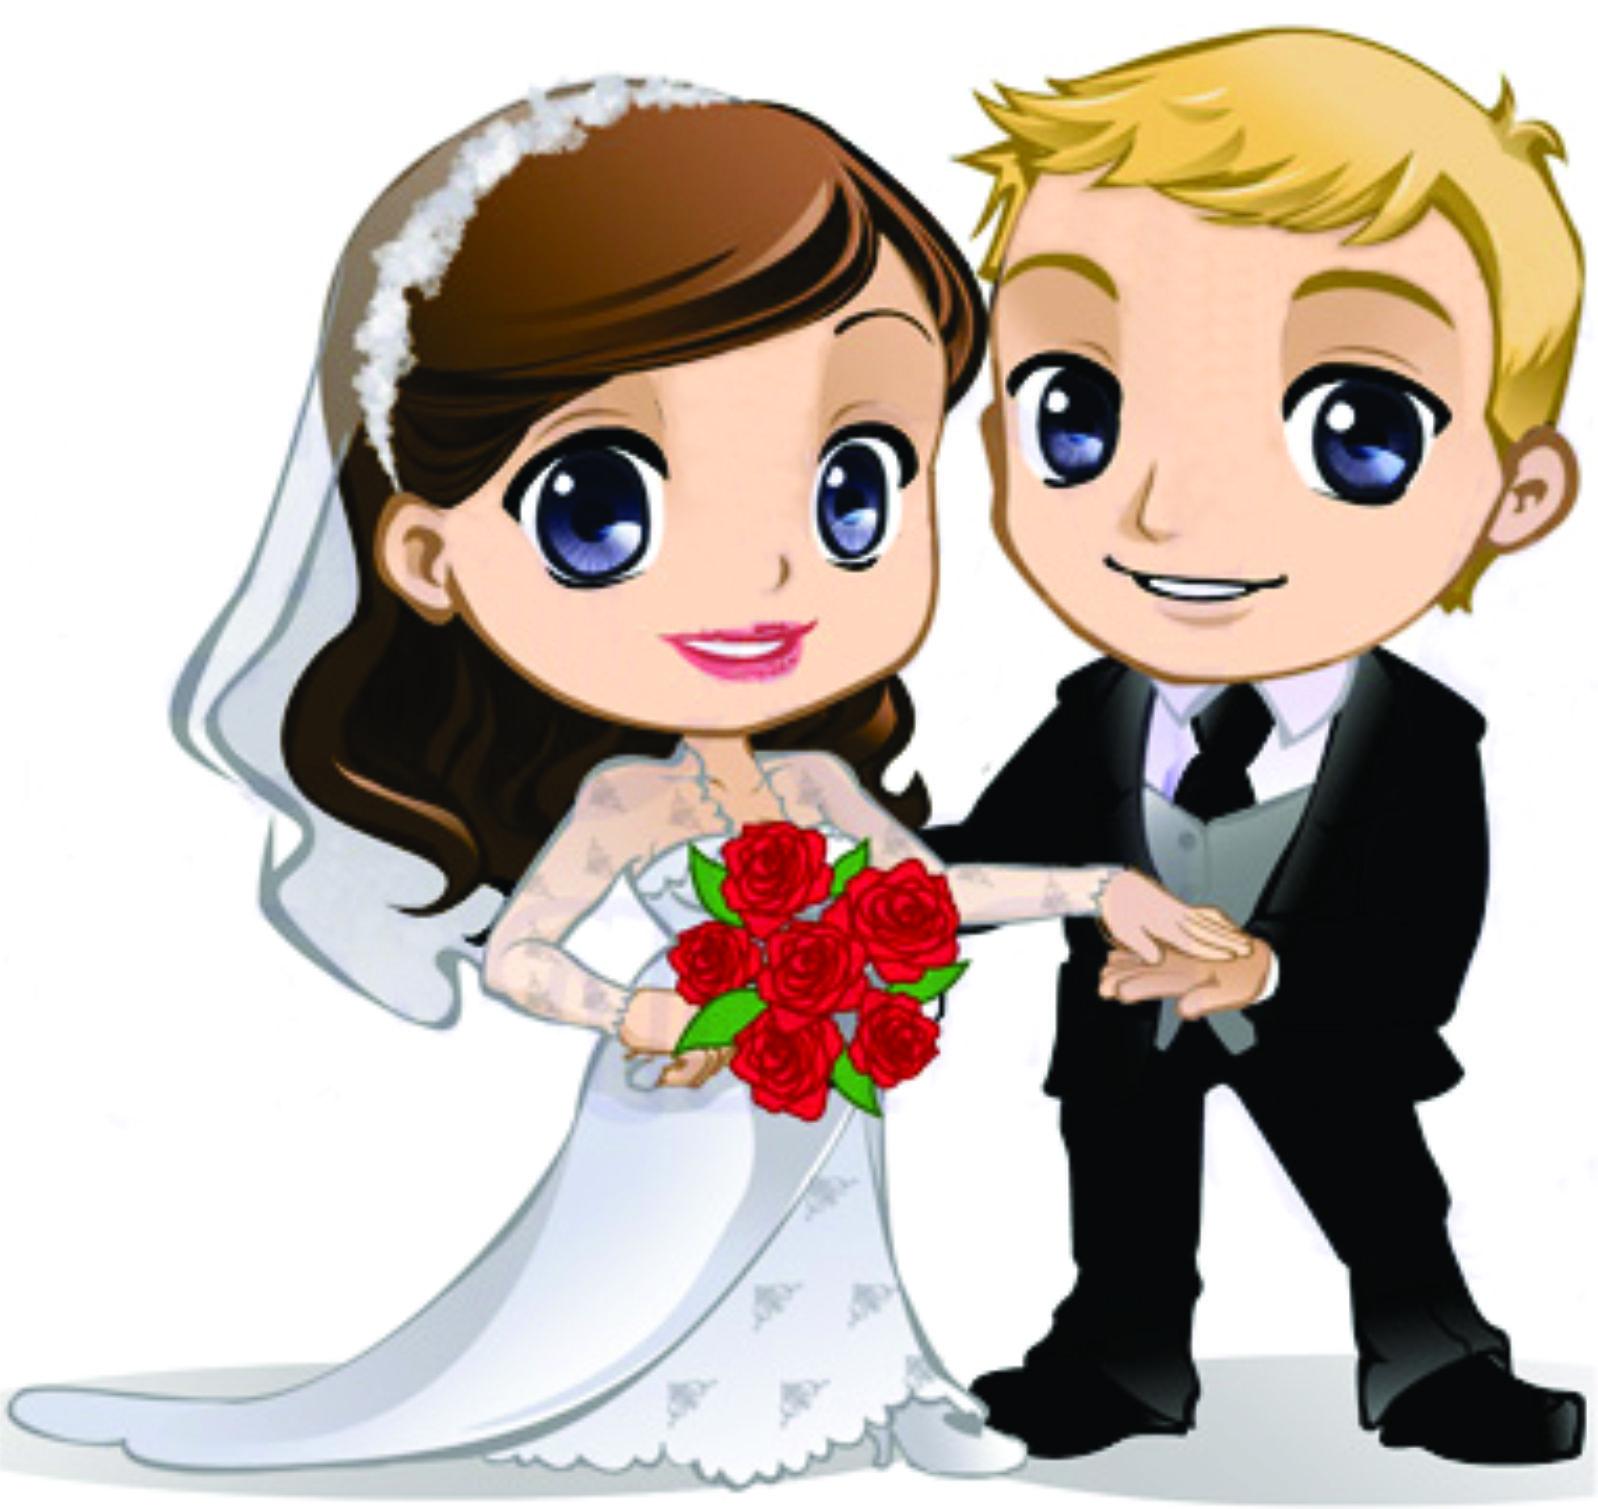 Novios caricatura clipart png black and white Dibujos. Clipart. Digi stamp - Novios. Bodas. Wedding ... png black and white